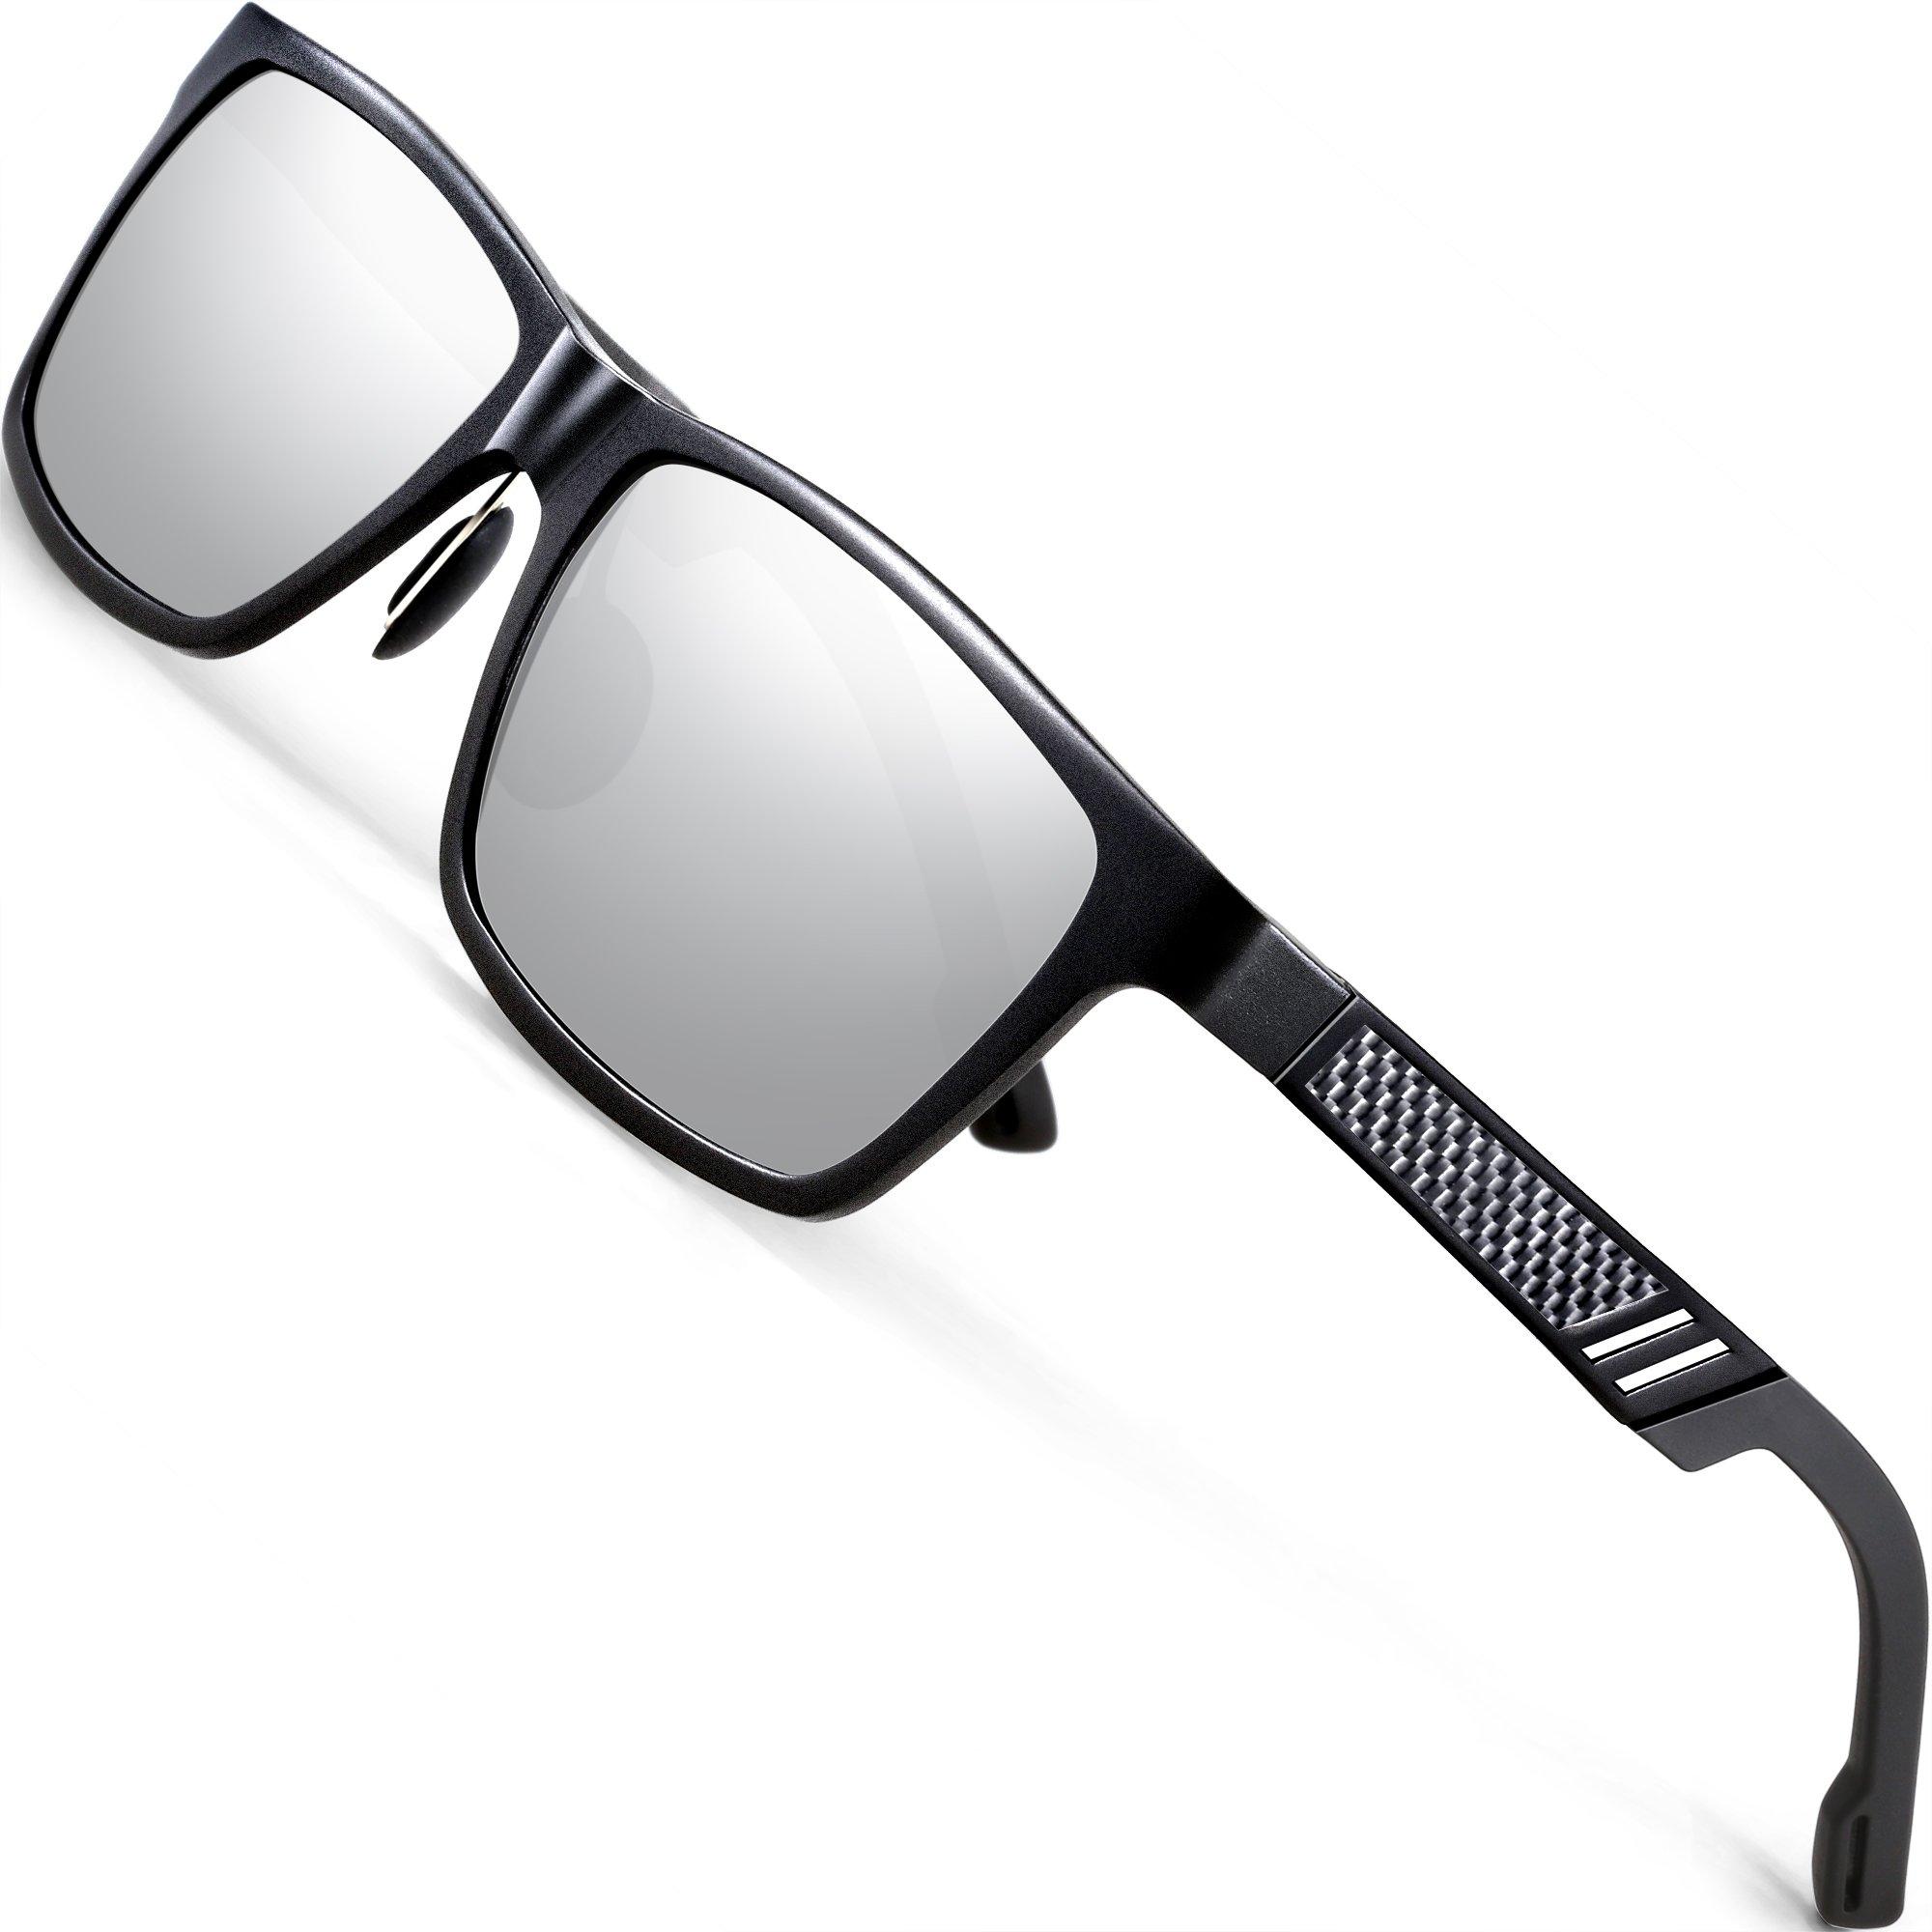 AFARER sonnenbrille herren polarisiert fahren Al-Mg métal rahme Schwarz TjH6U46HnK